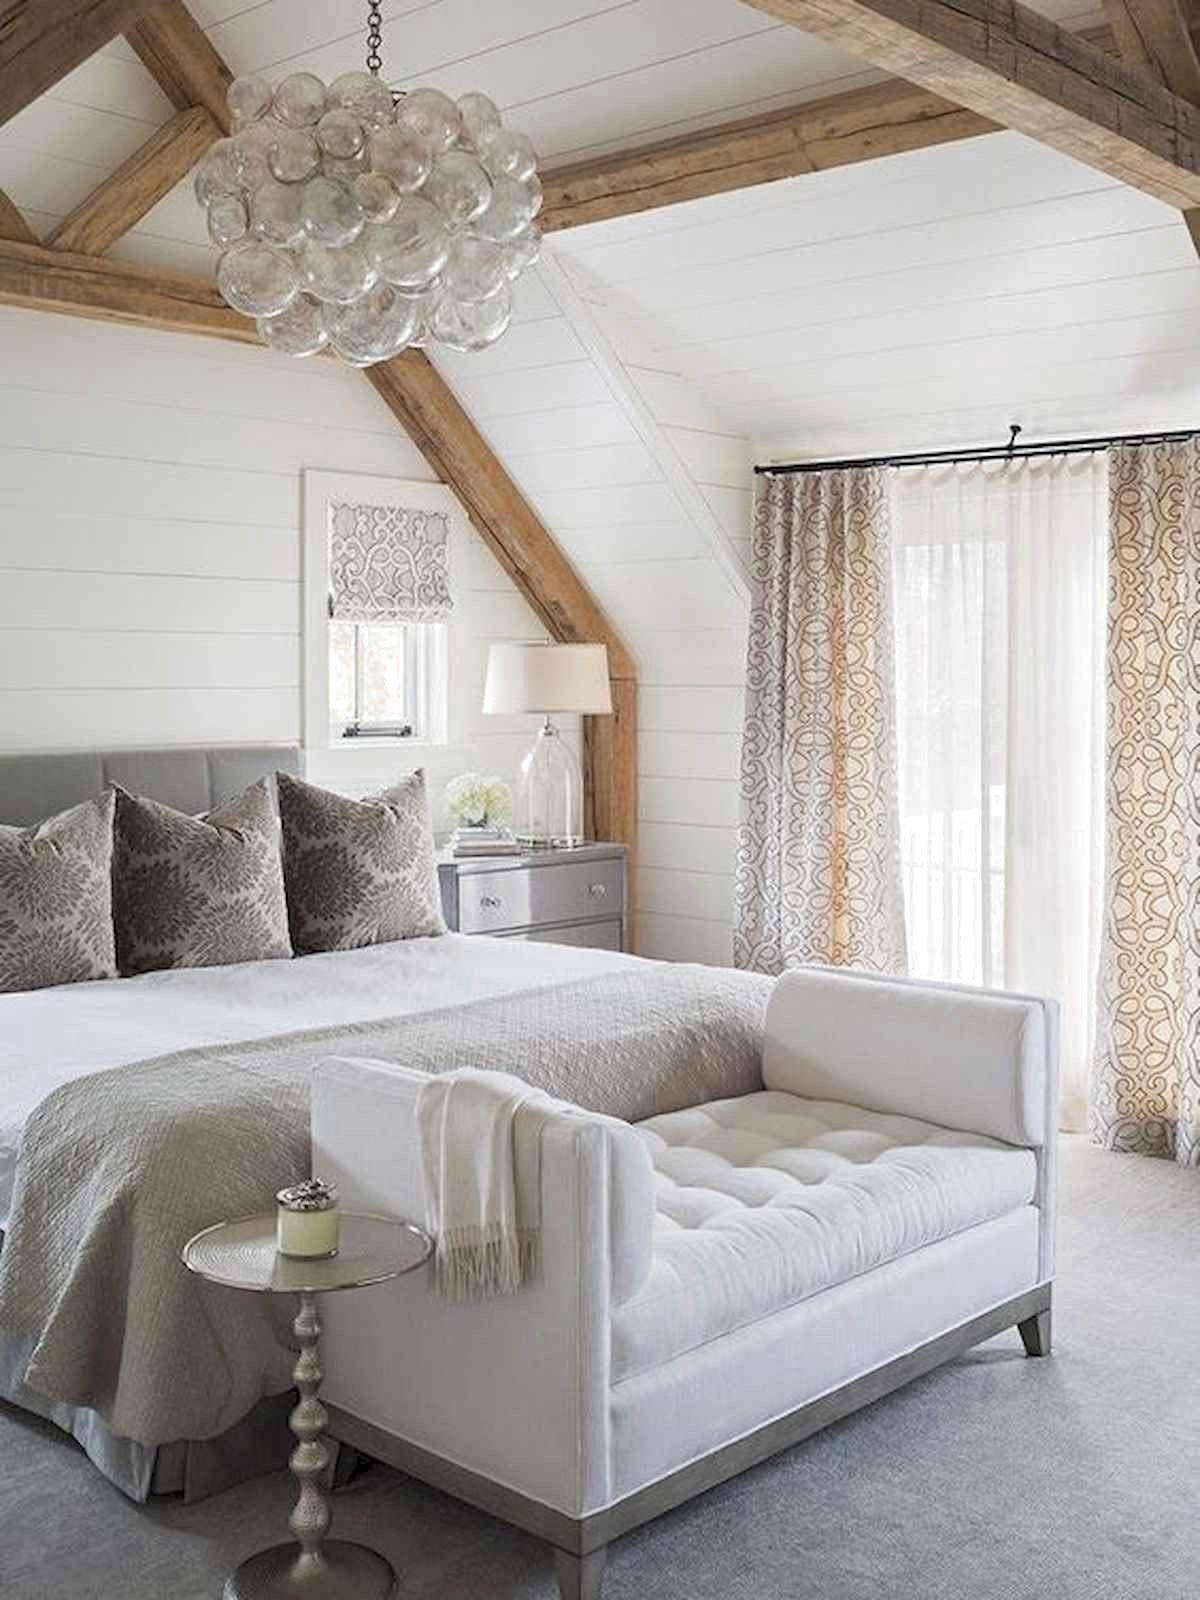 50 Favourite Farmhouse Master Bedroom Decor Ideas Grey Bedroom Decor Master Bedrooms Decor Bedroom Interior